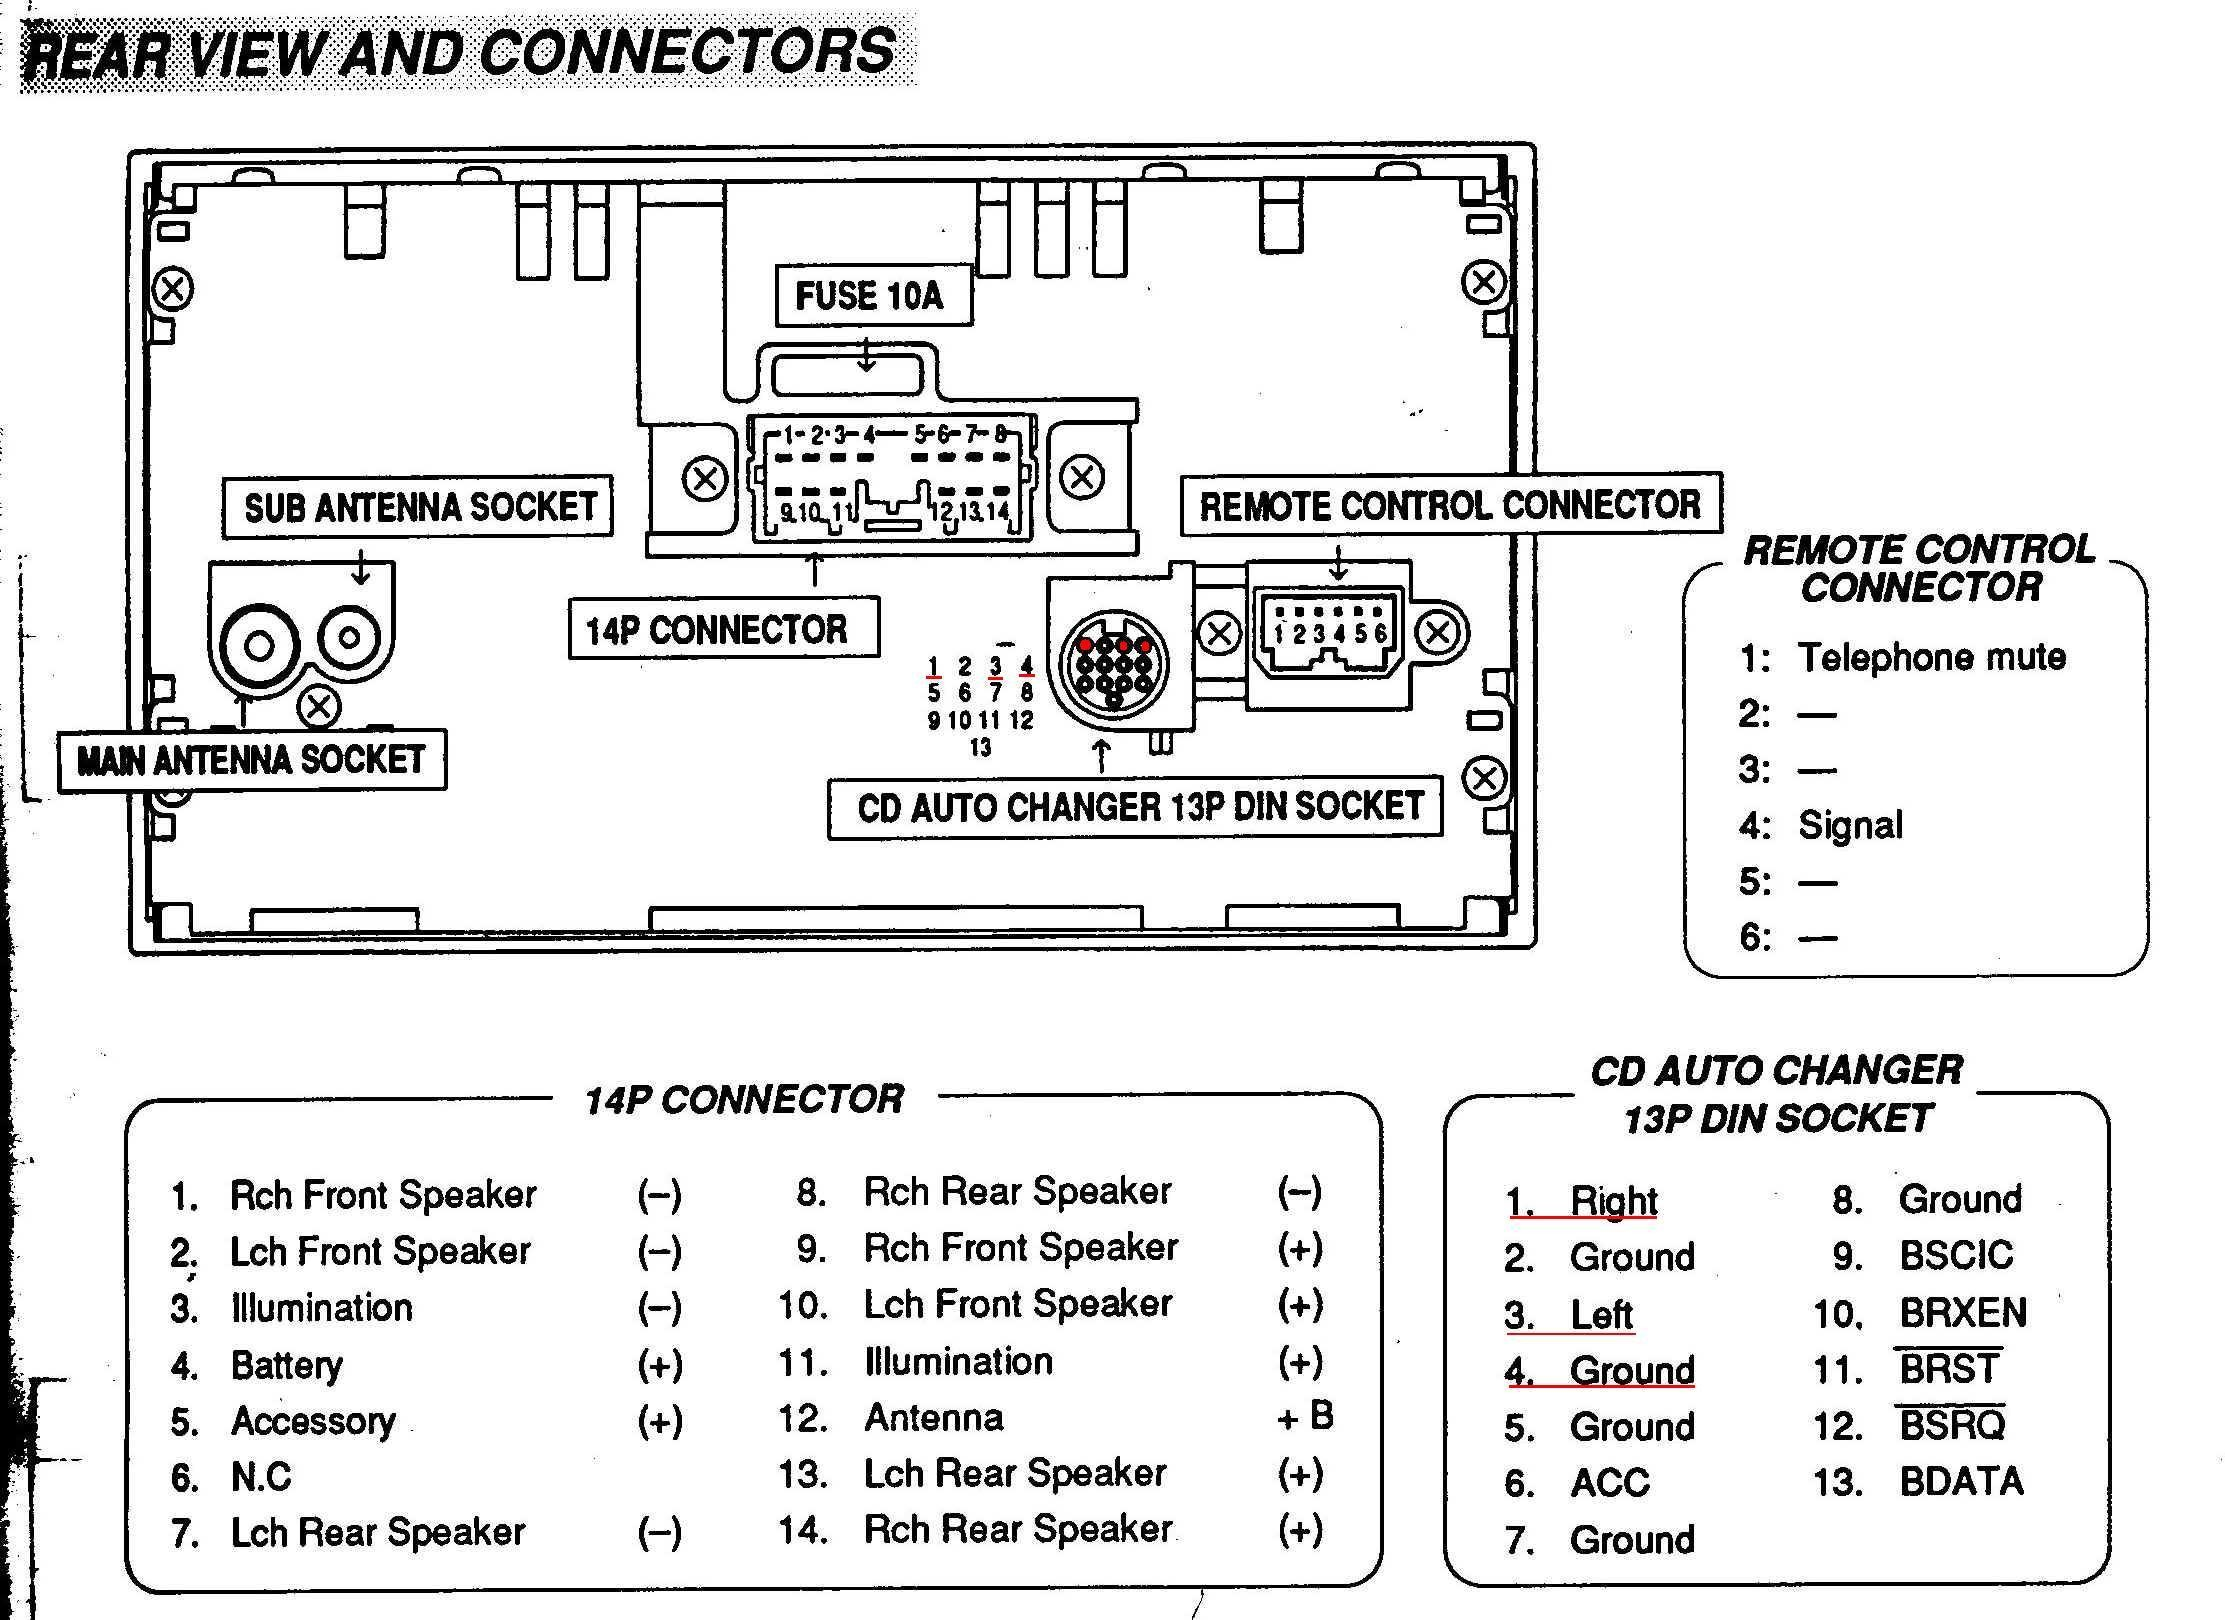 2002 Jeep Grand Cherokee Radio Wiring Diagram from mainetreasurechest.com